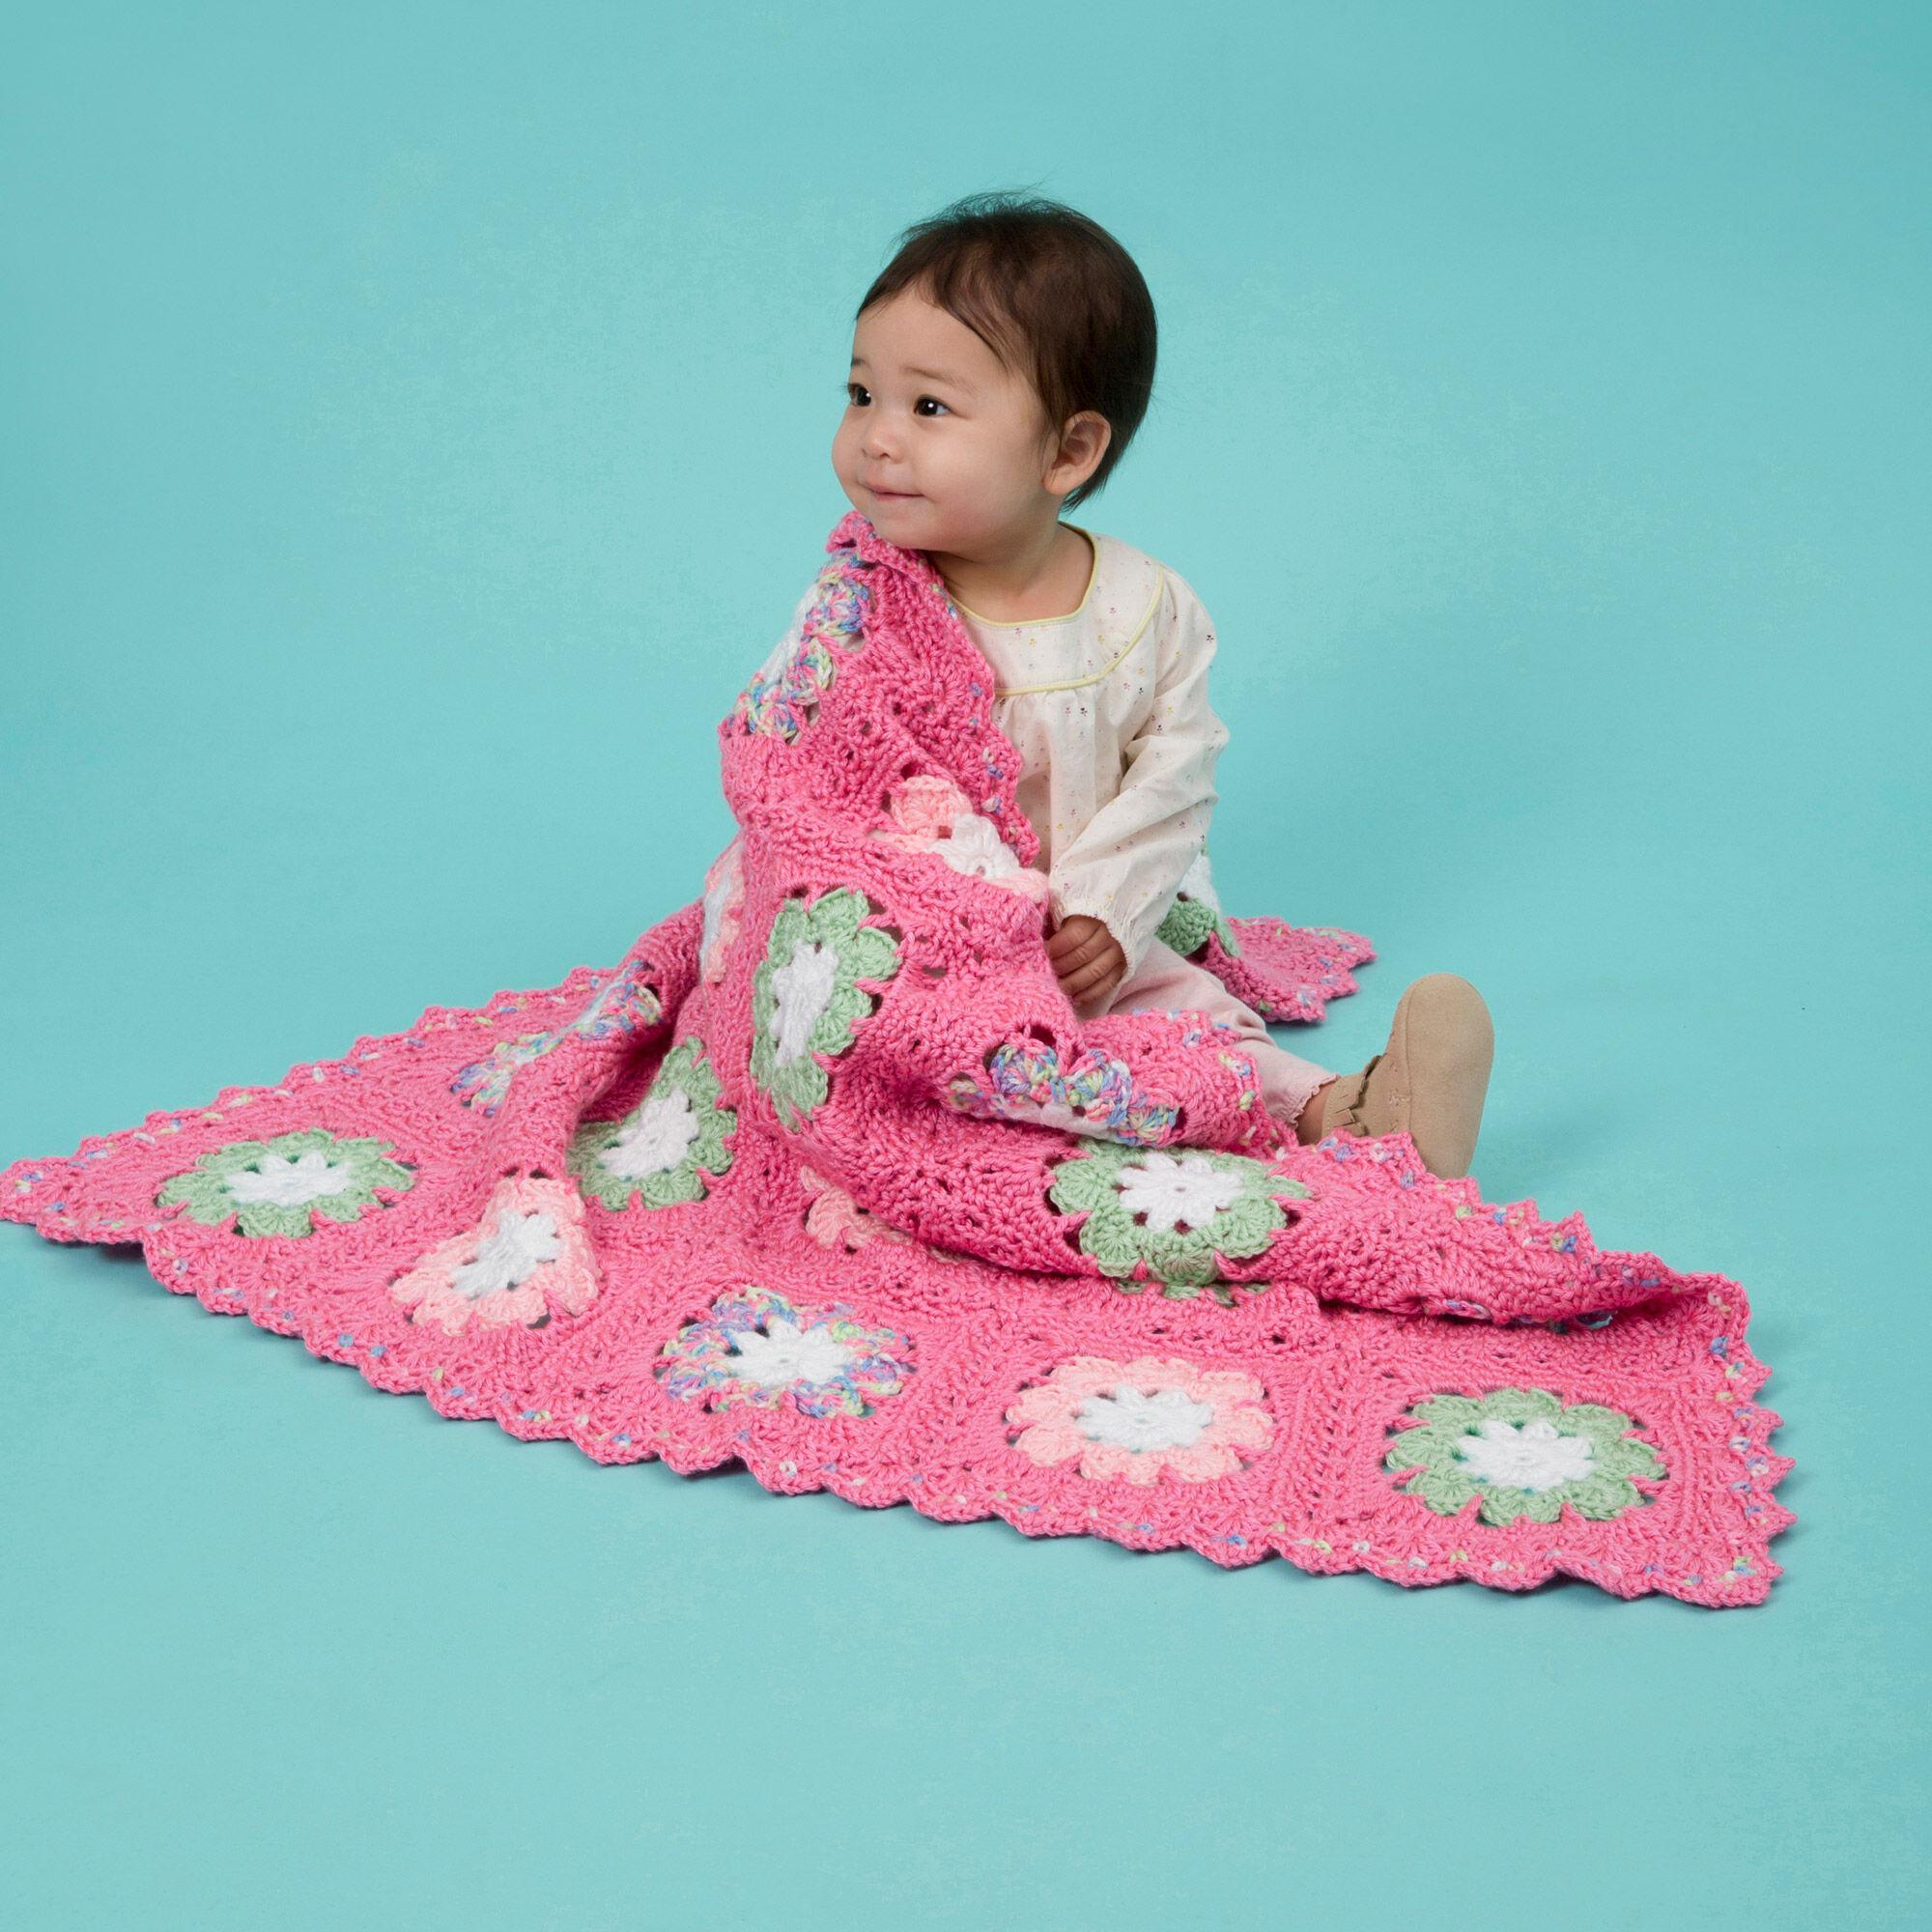 Red Heart Flower Baby Blanket | Yarnspirations